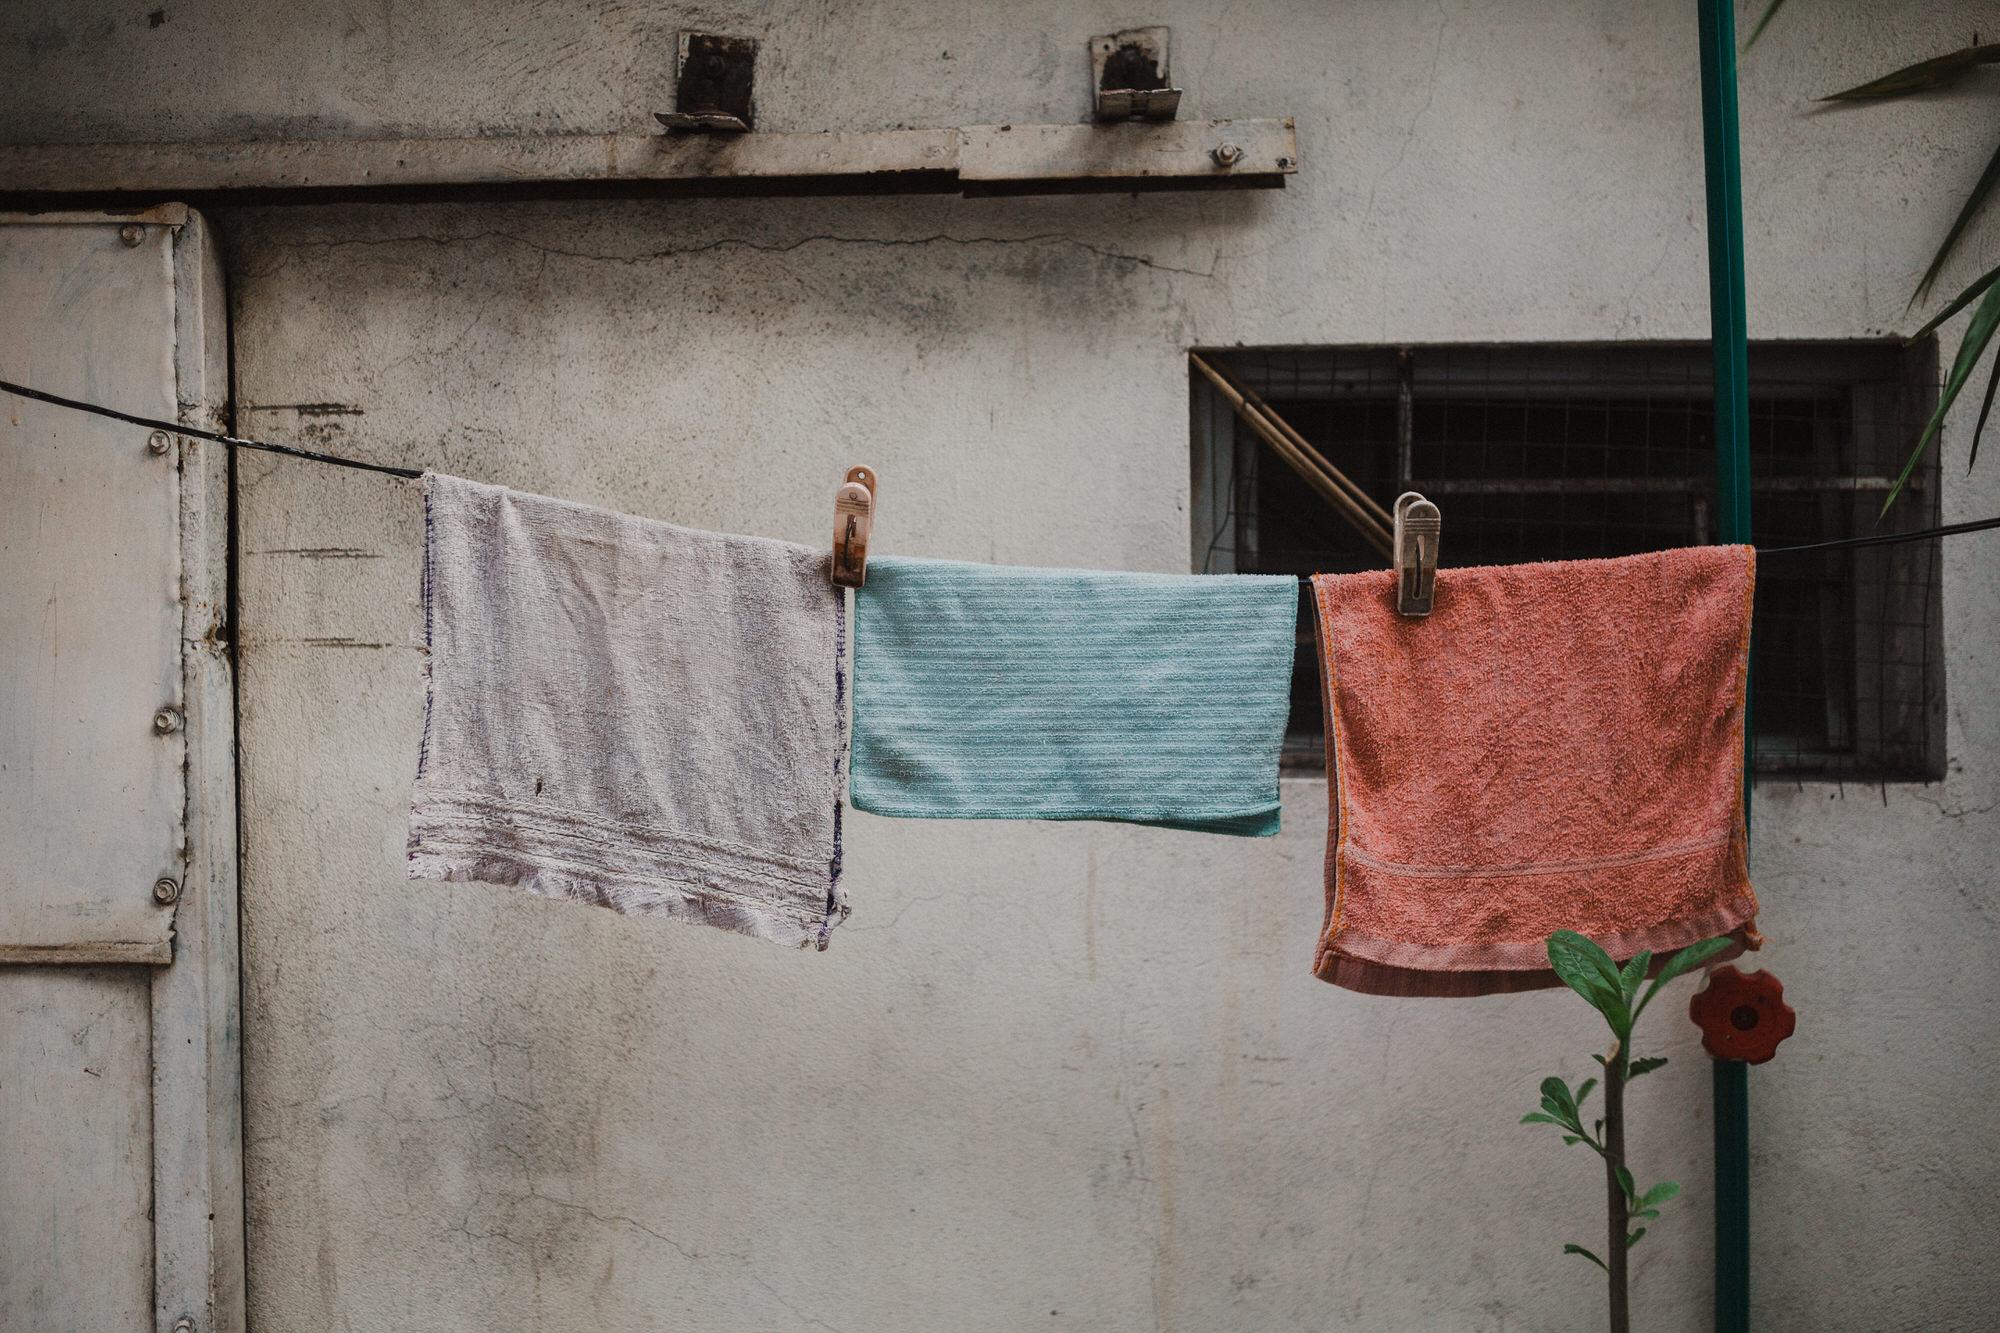 hanoivietnamcitytravelblog-9784-1.jpg